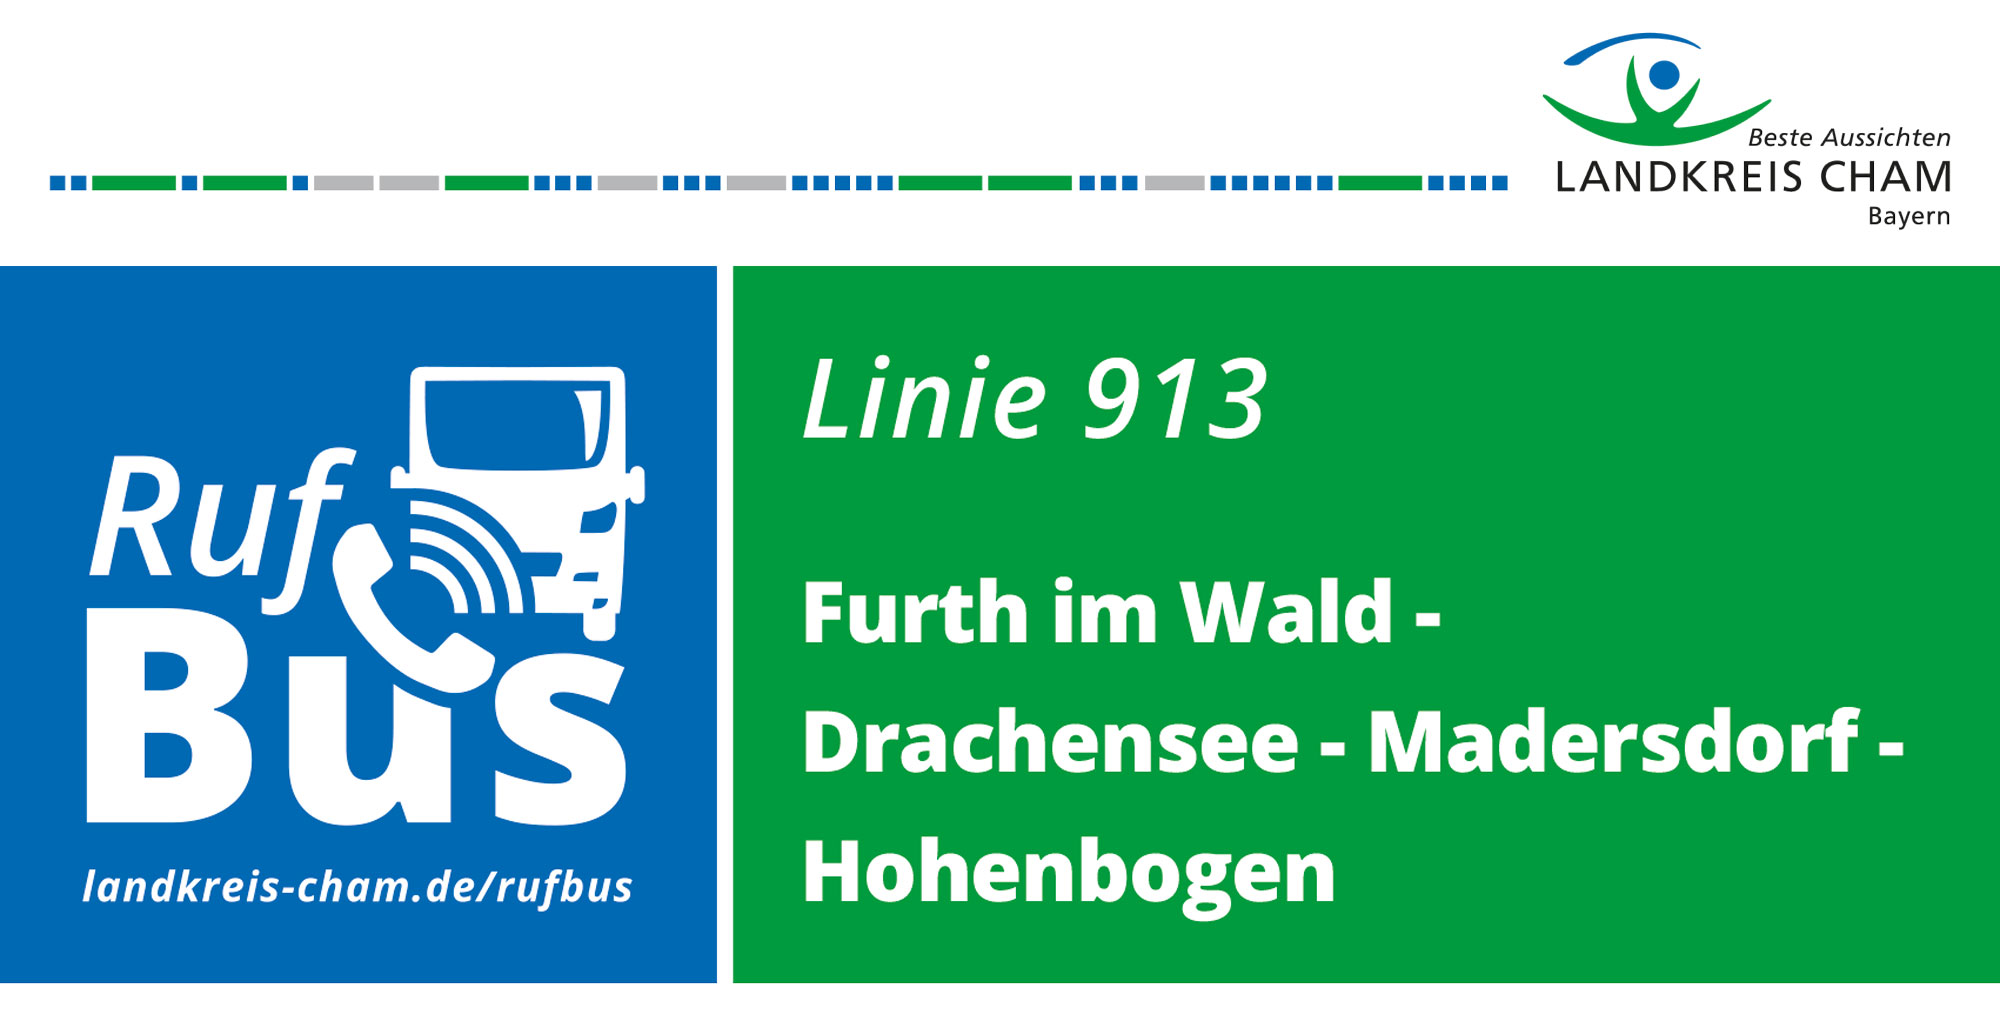 Rufbus-Busschild.jpg